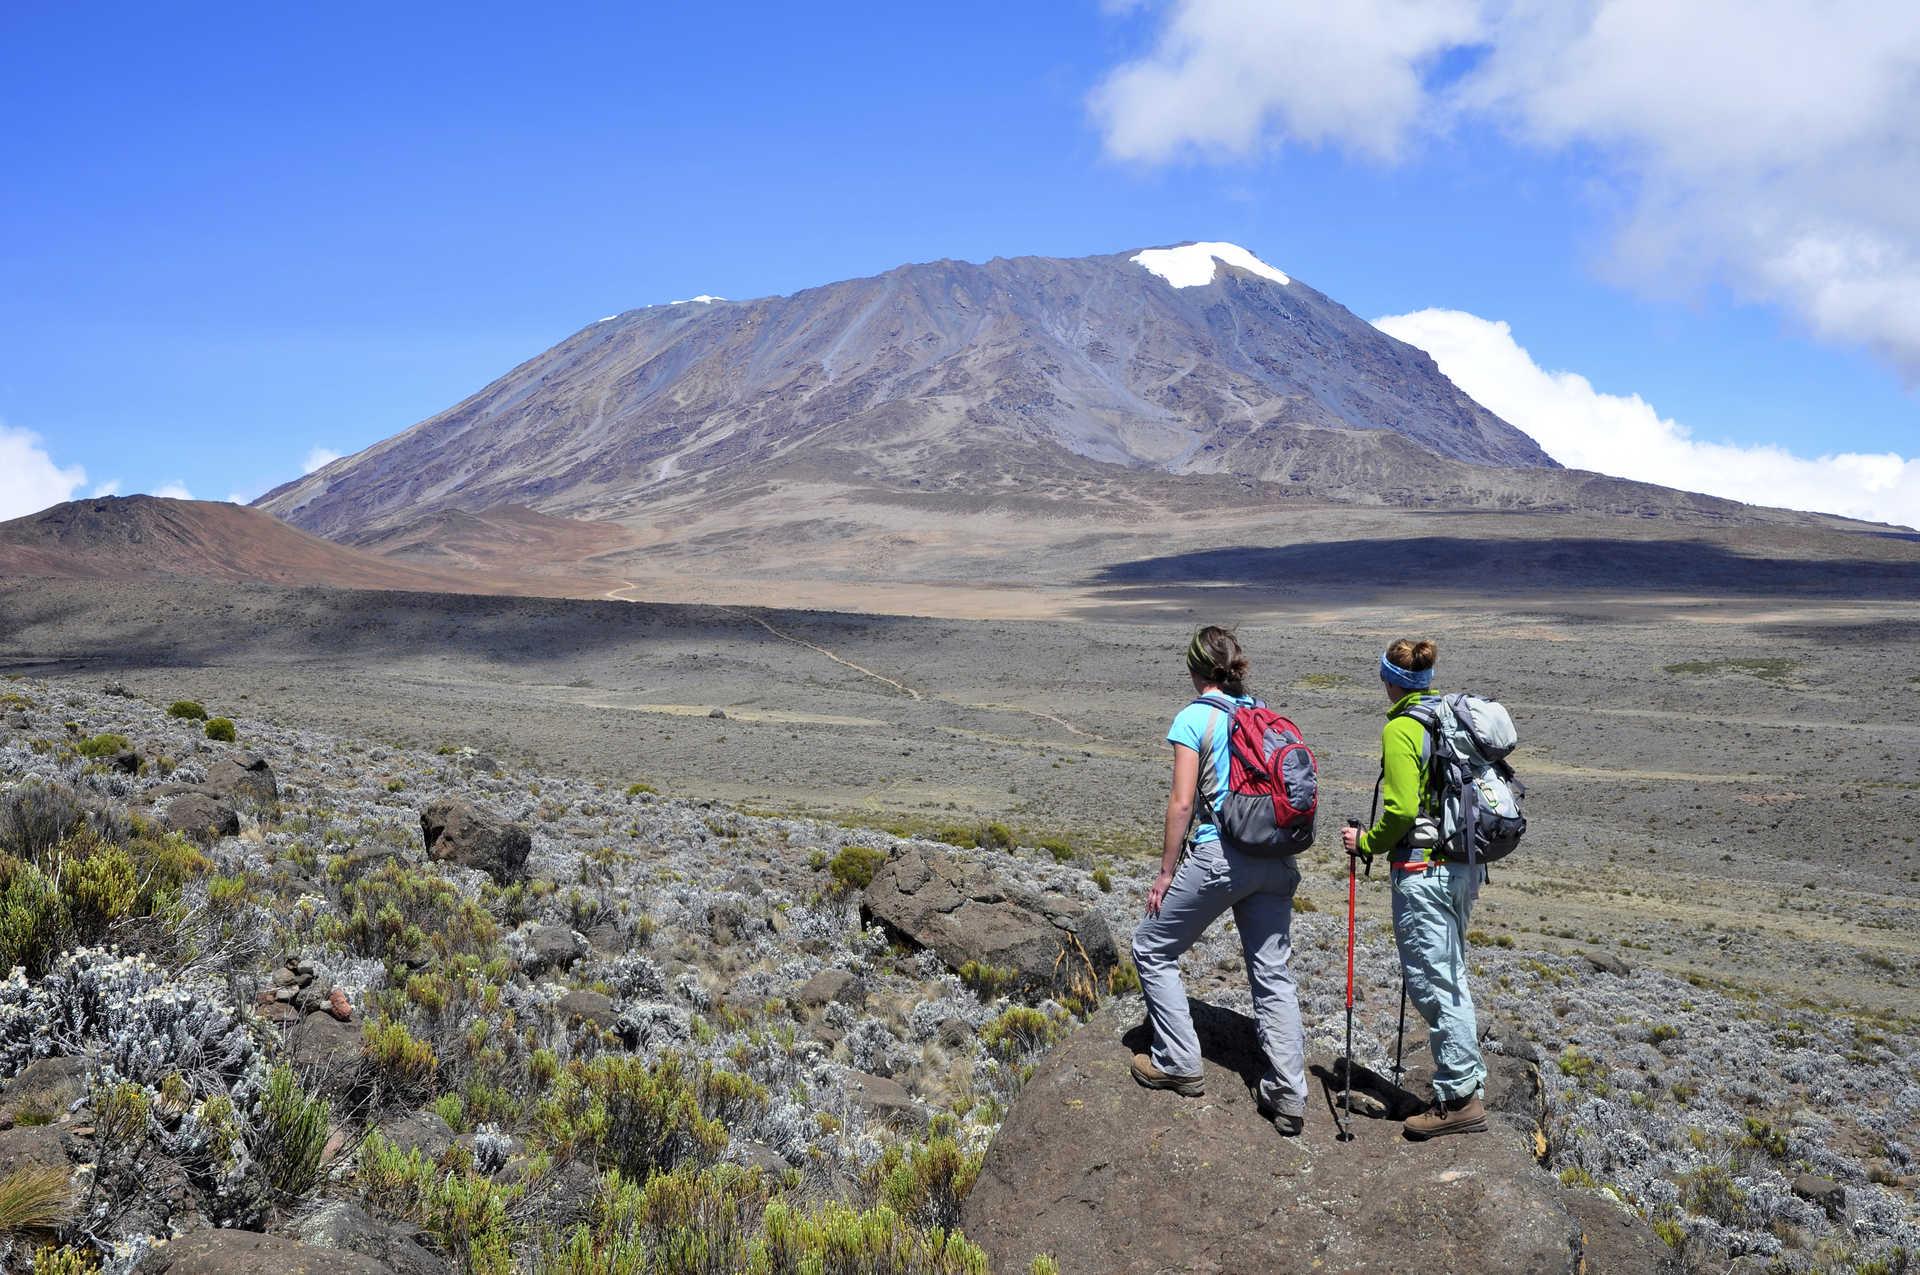 Hikers looking at the Mount Kilimanjaro